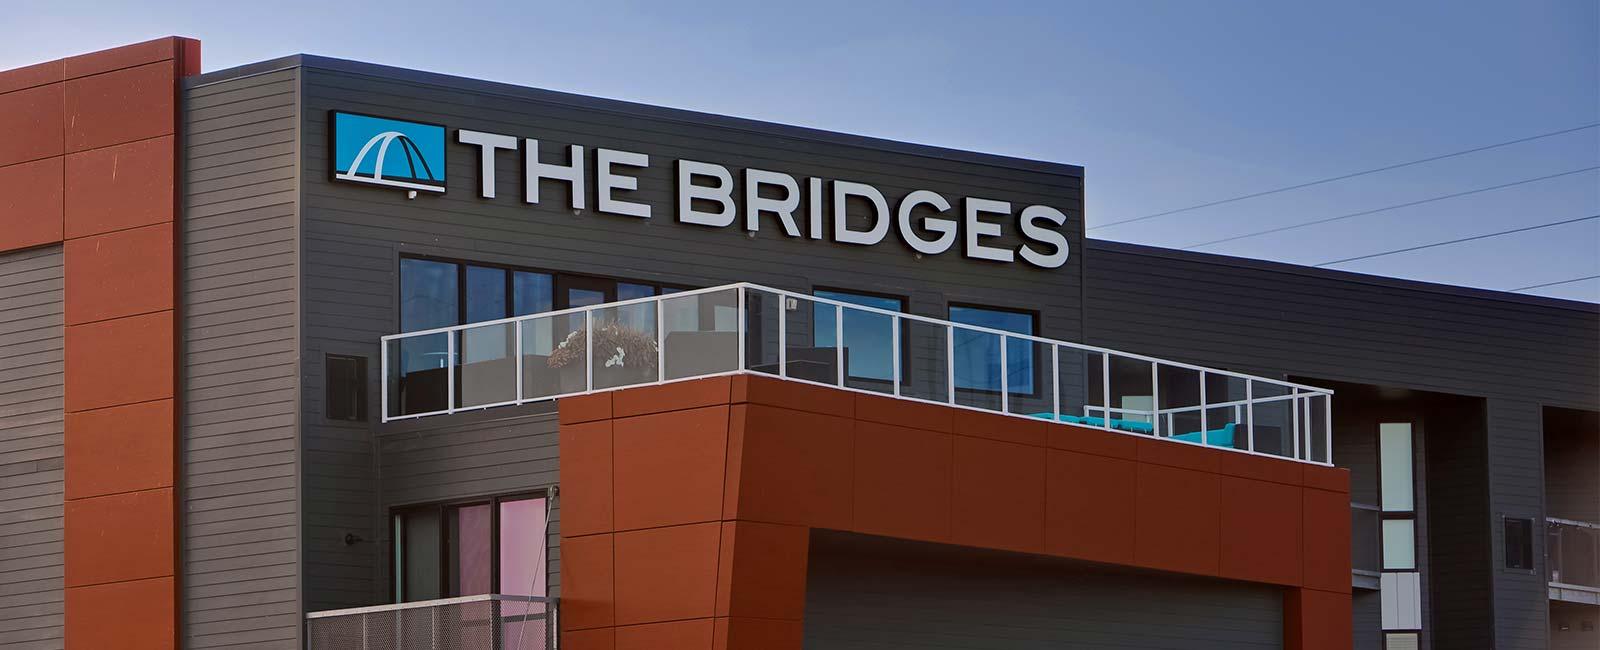 The Bridges Lofts